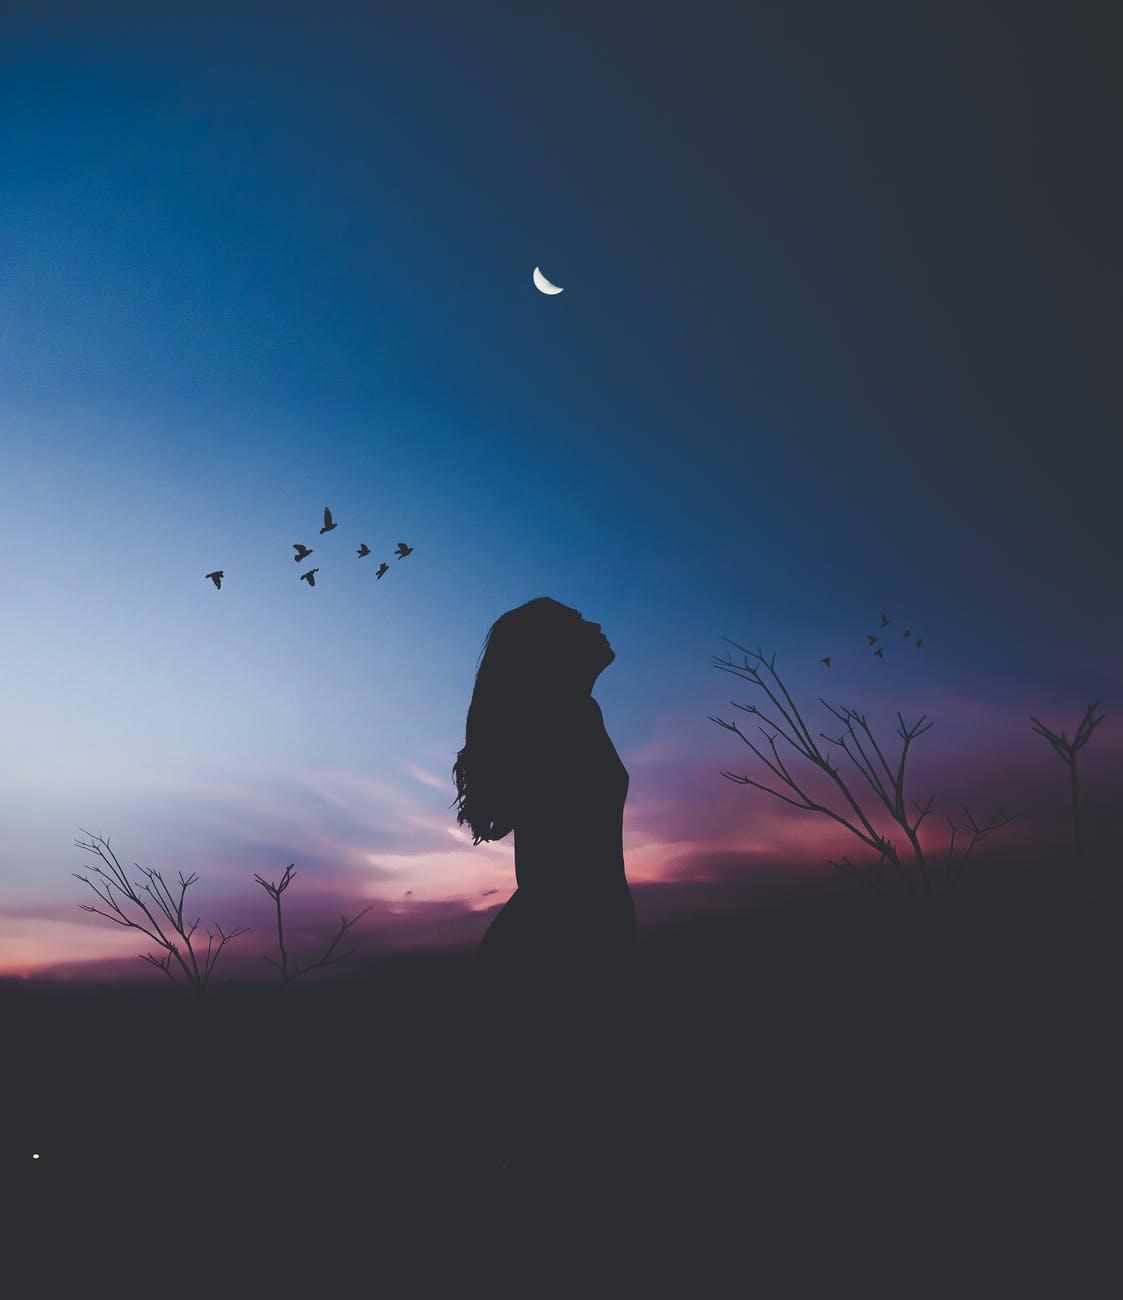 In My Solitude